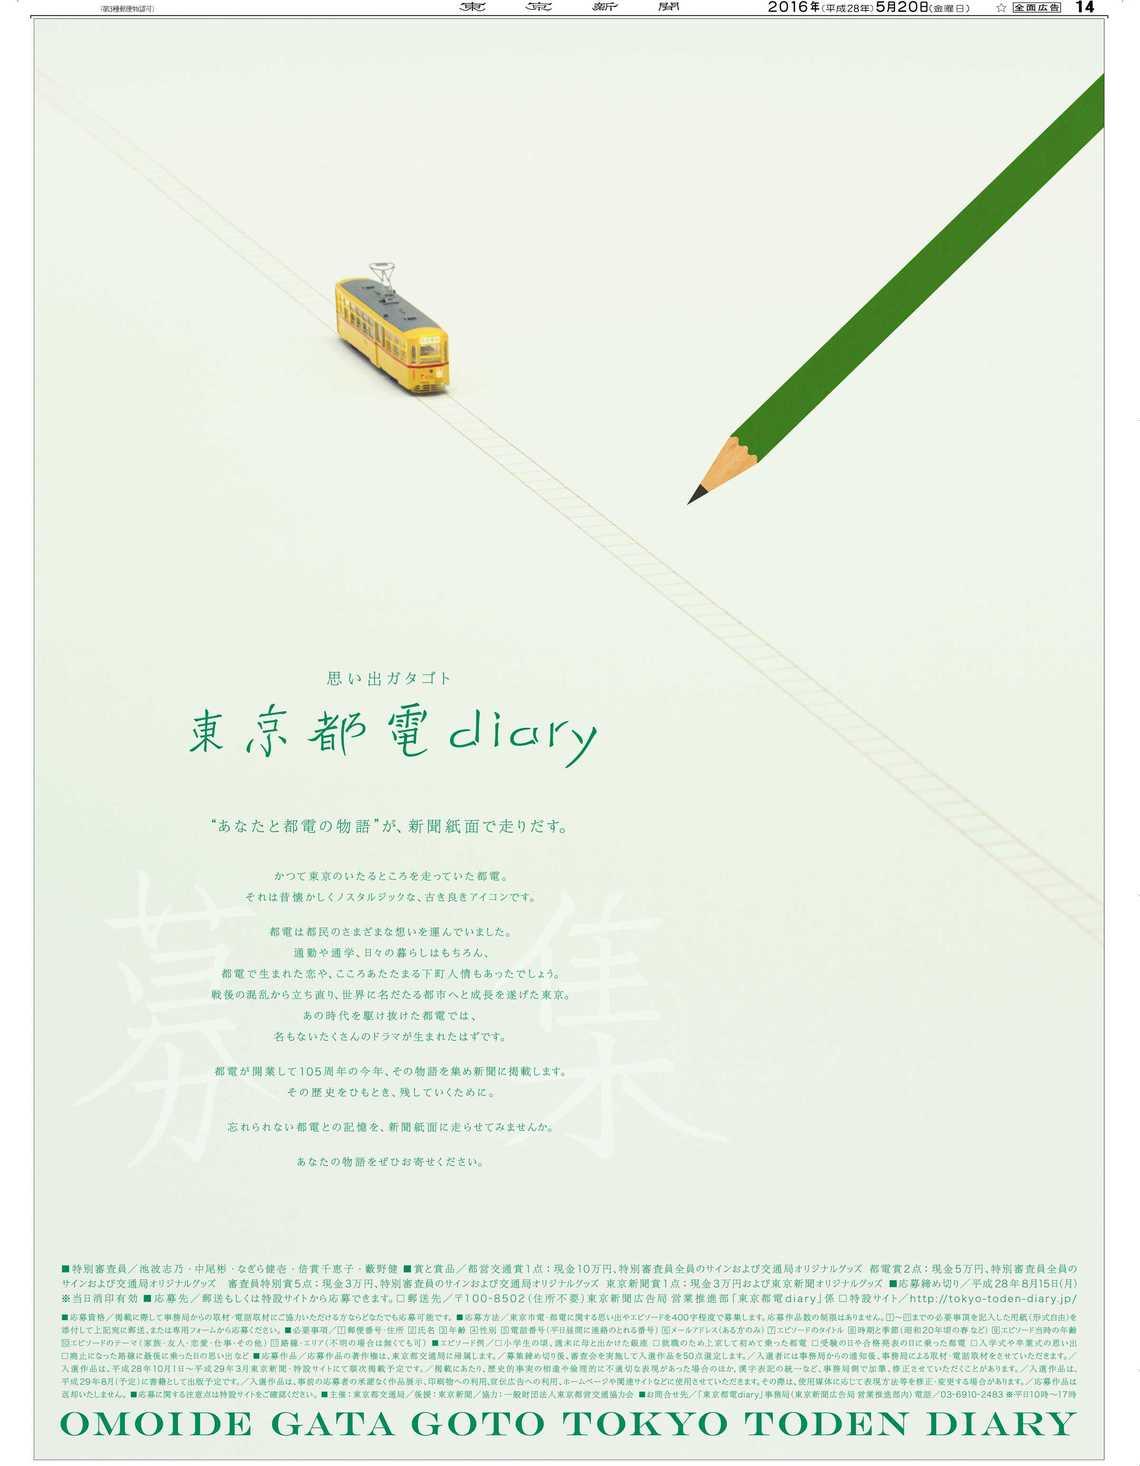 東京都交通局「思い出ガタゴト 東京都電diary」